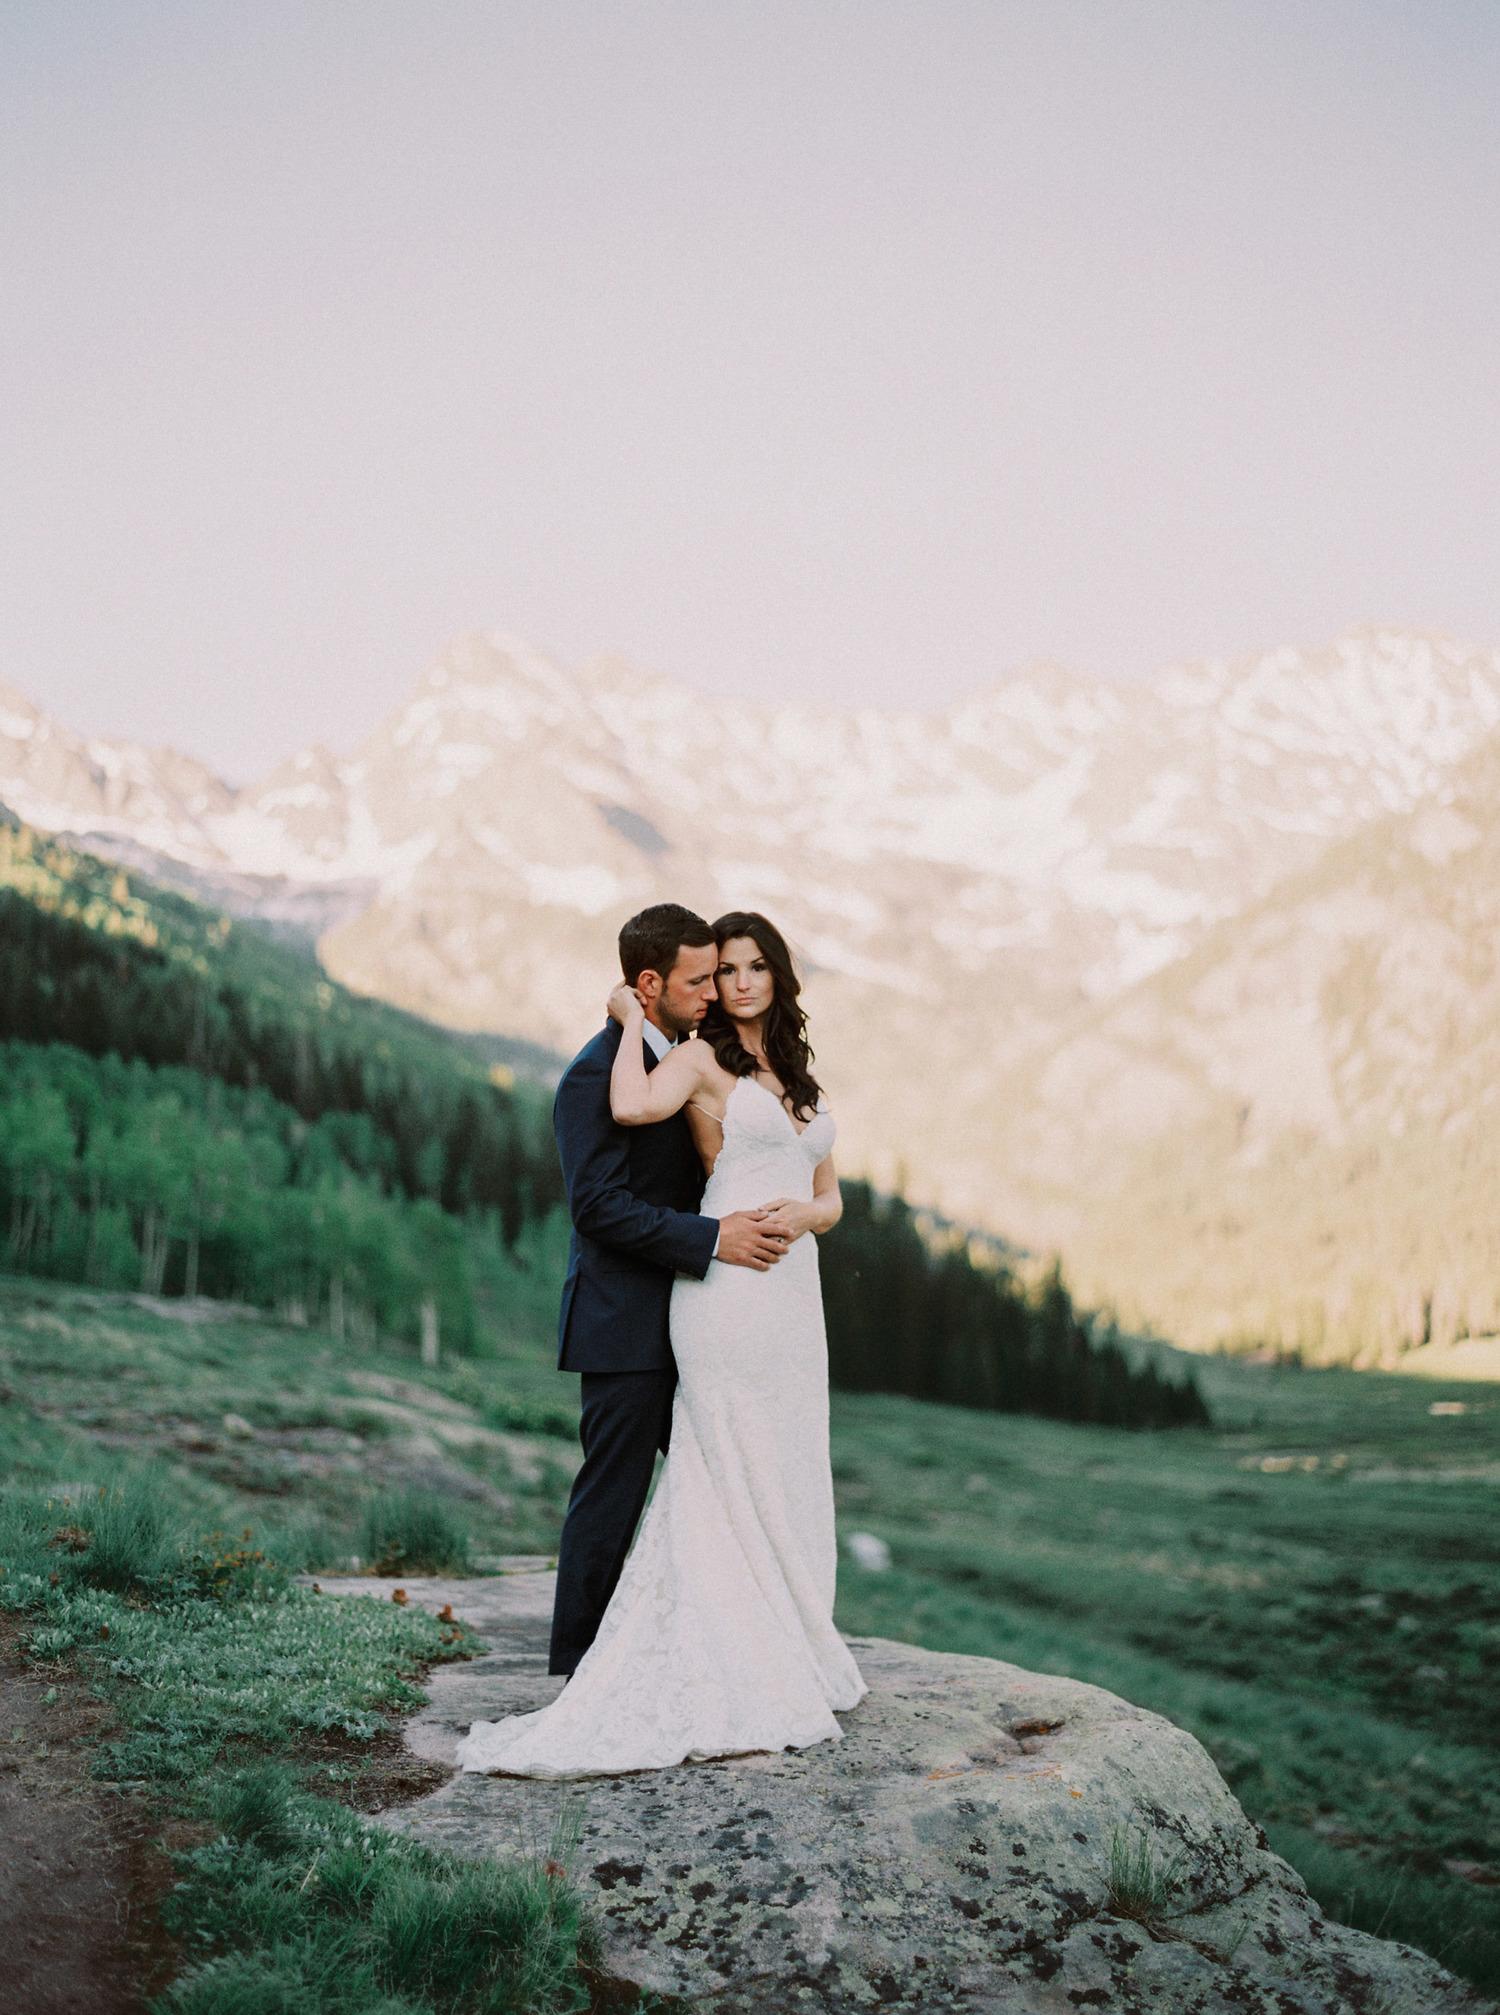 Bride and groom outdoor photo at ski resort